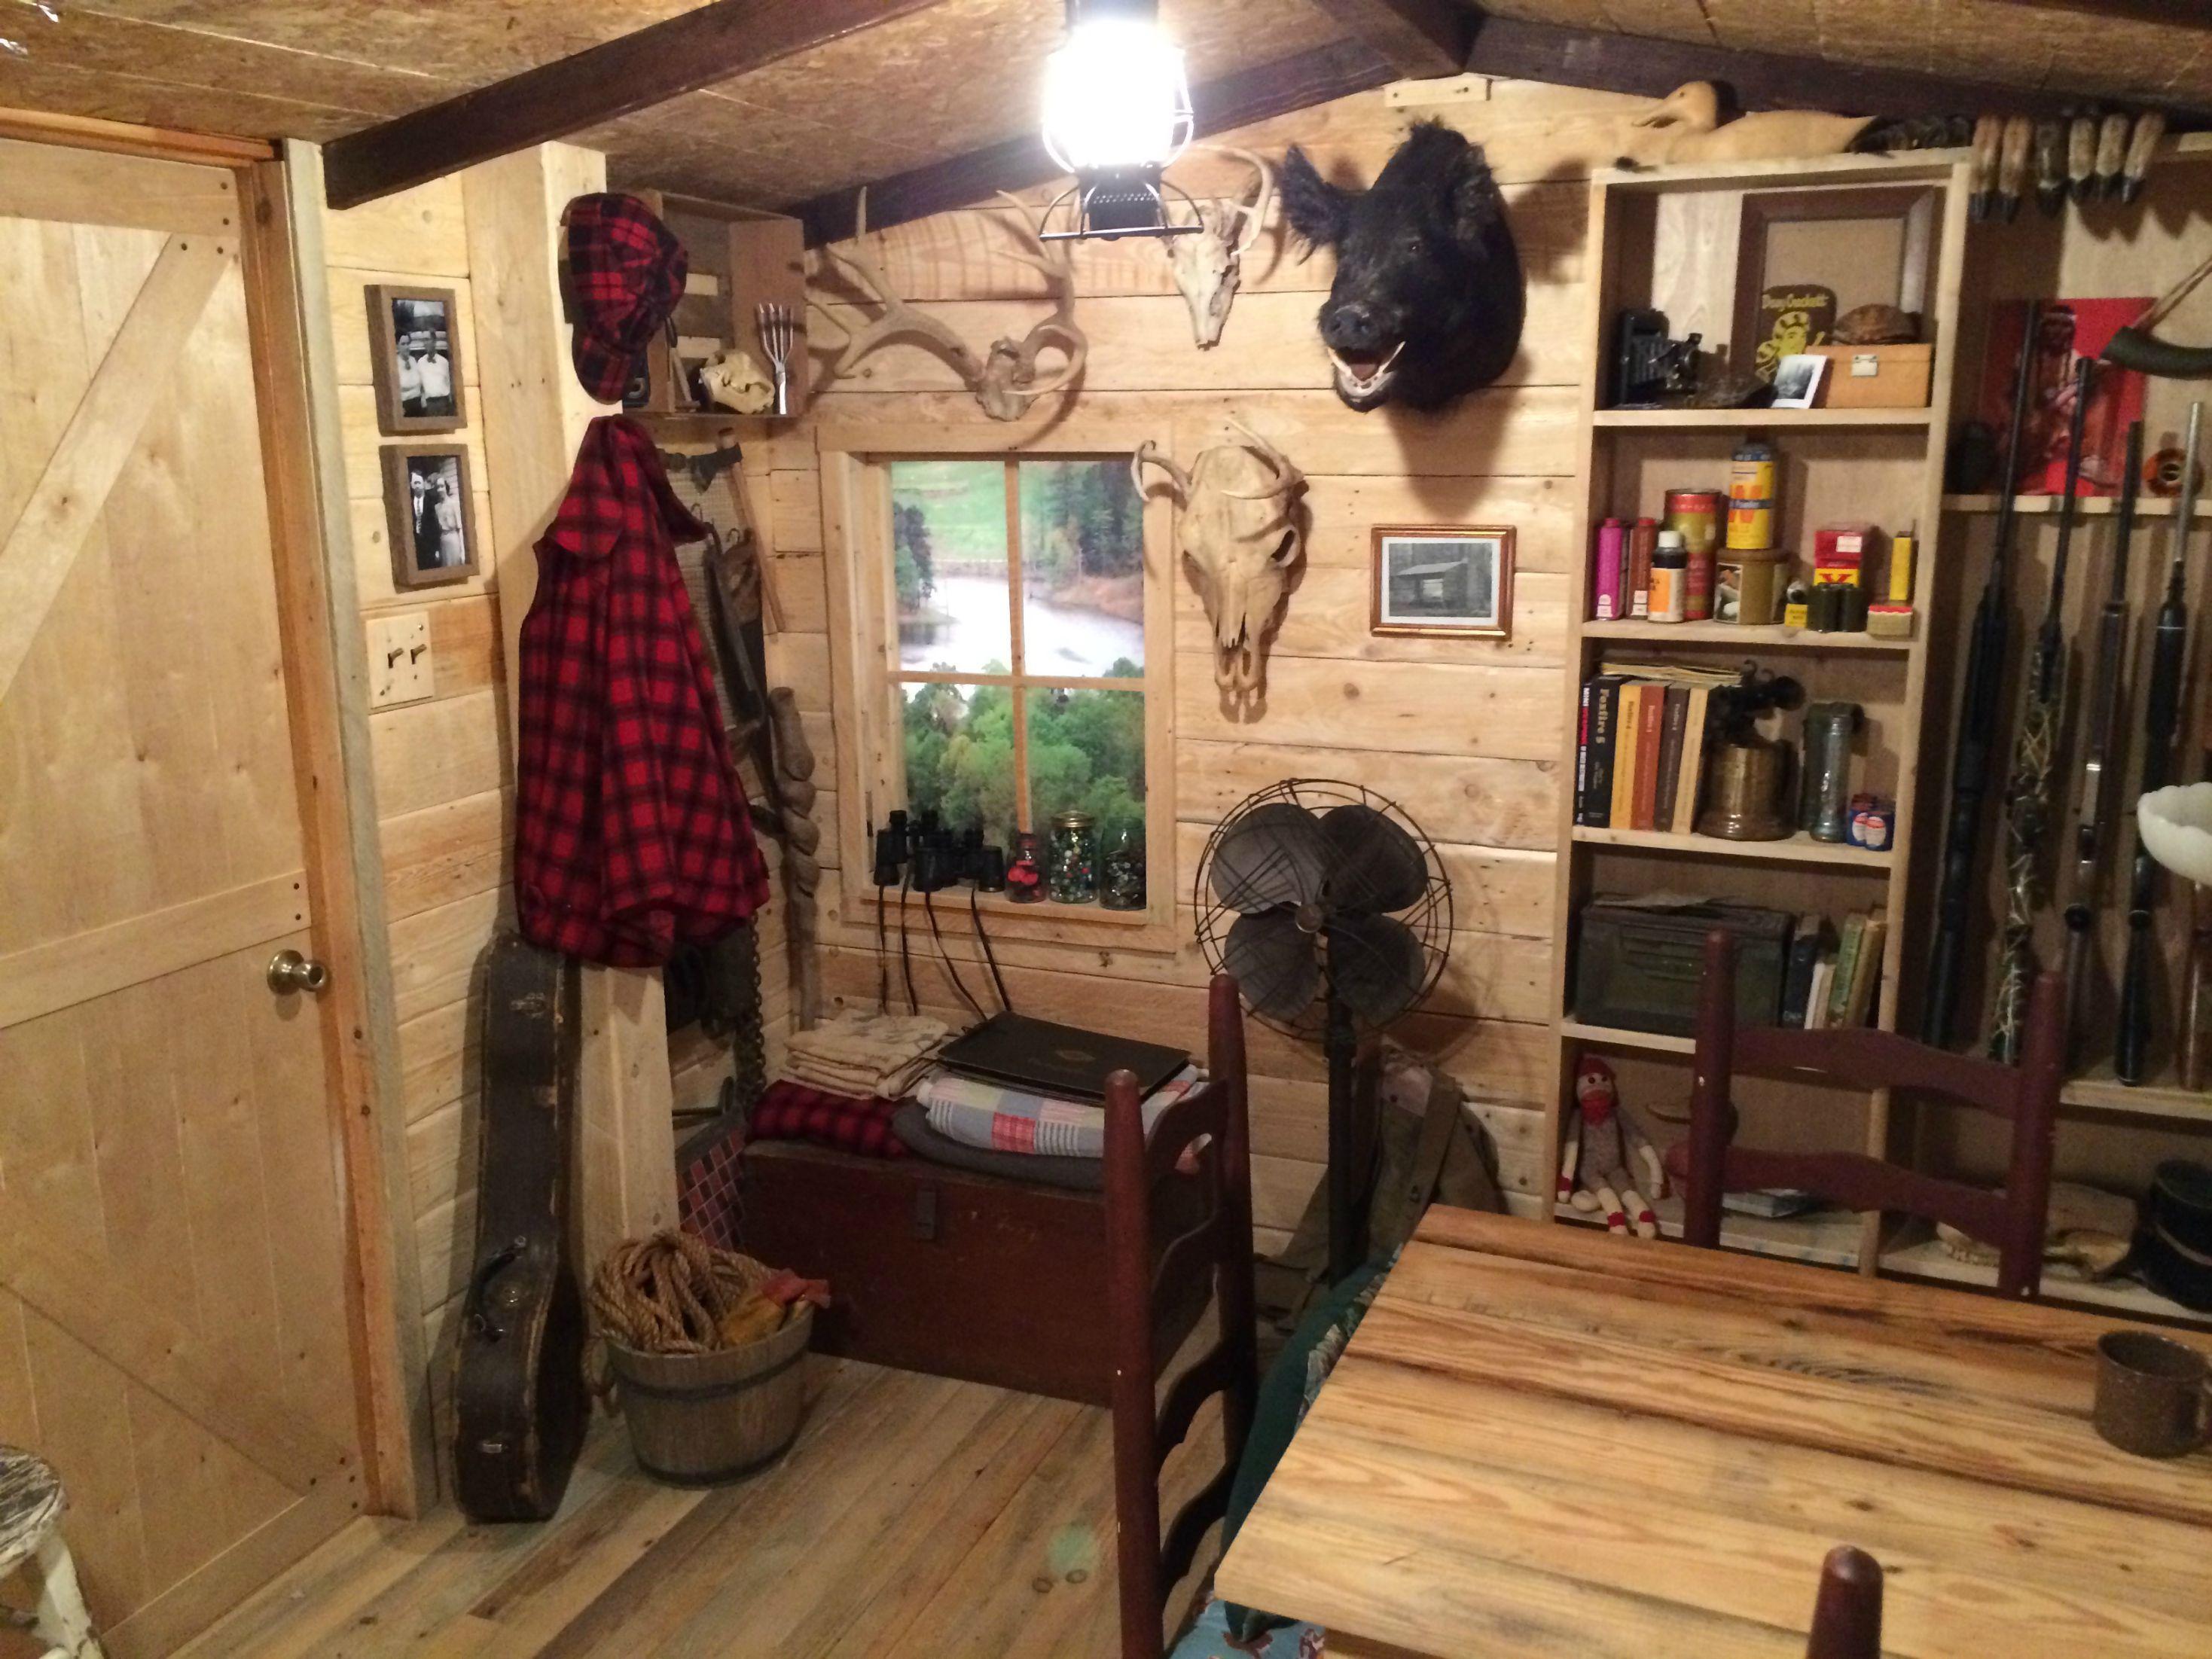 107 Rustic Cabin Man Cave I Built In My Basement Imgur Rustic